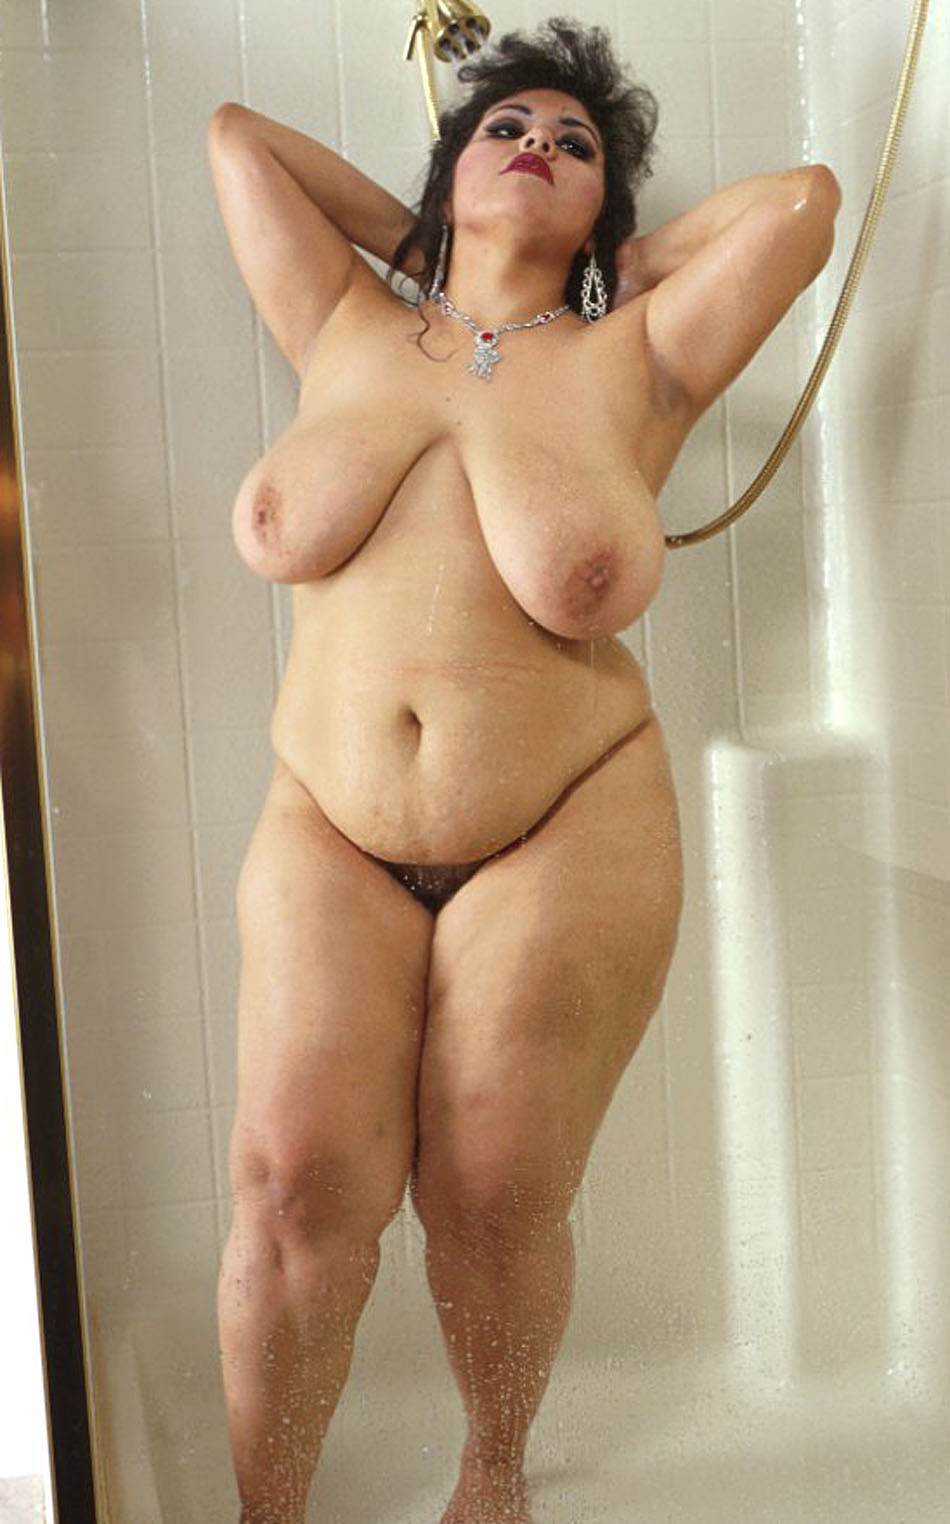 Bbw Photo Porn asian bbw sex pic - megapornx